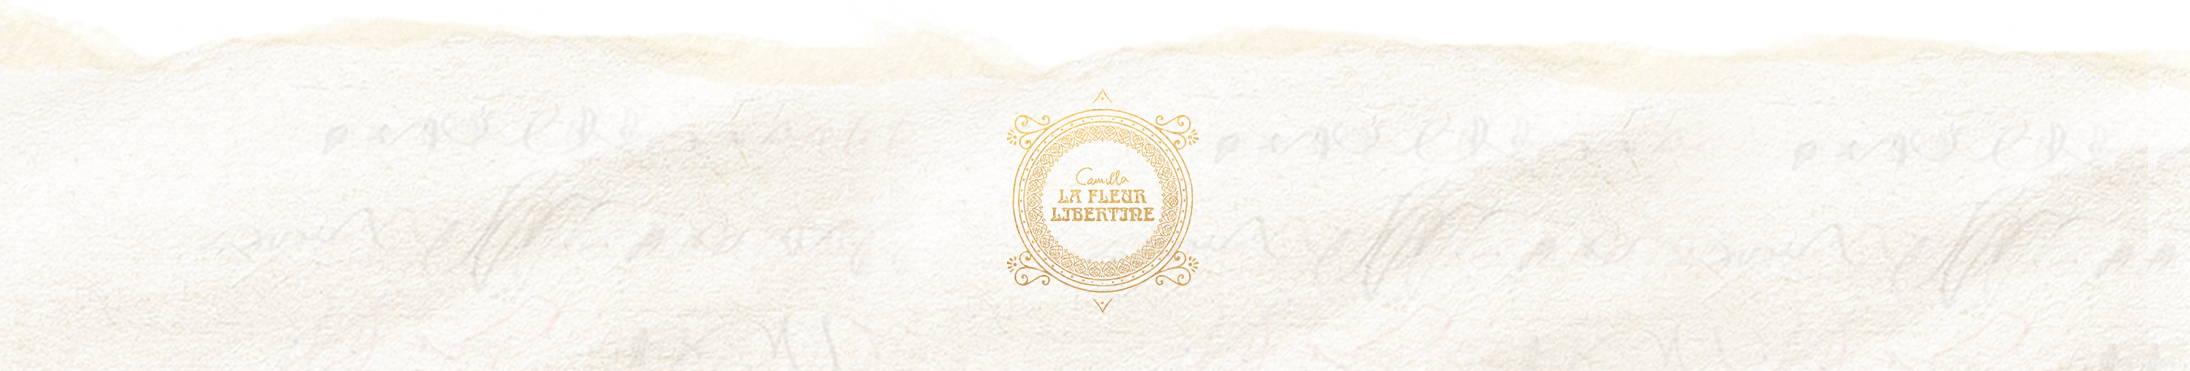 La Fluer Libertine